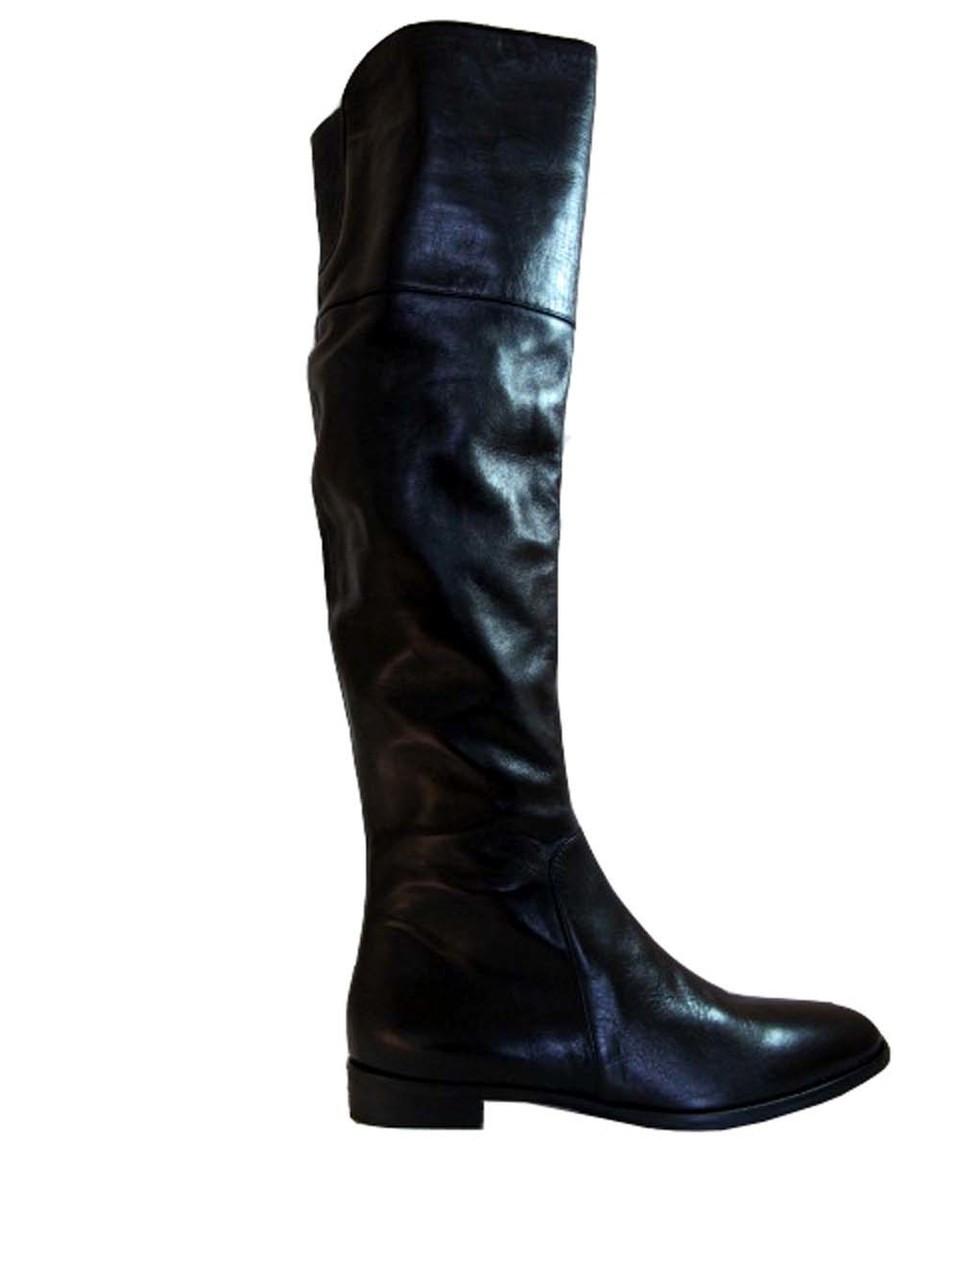 Flat Knee High boots Black